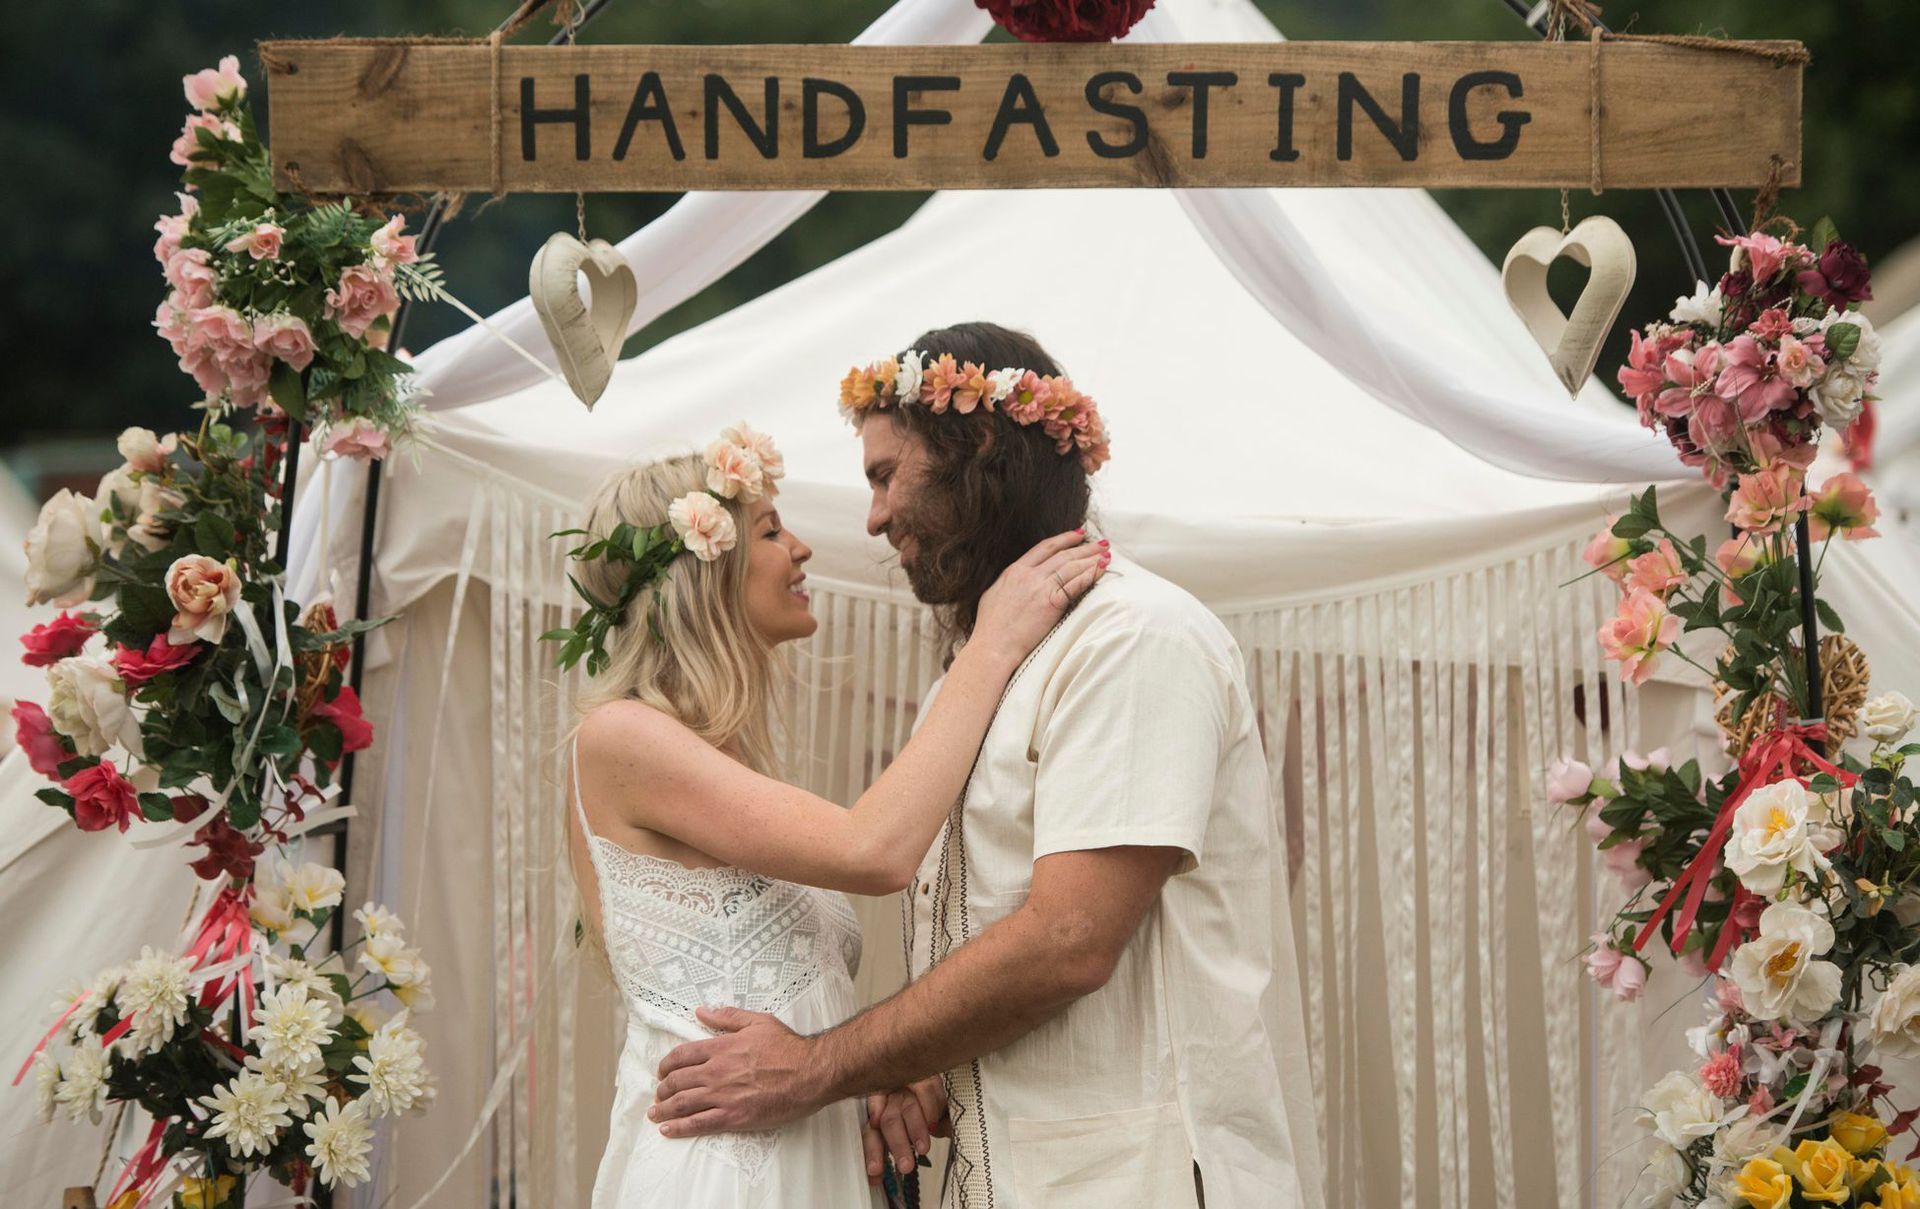 irish dating and marriage customs